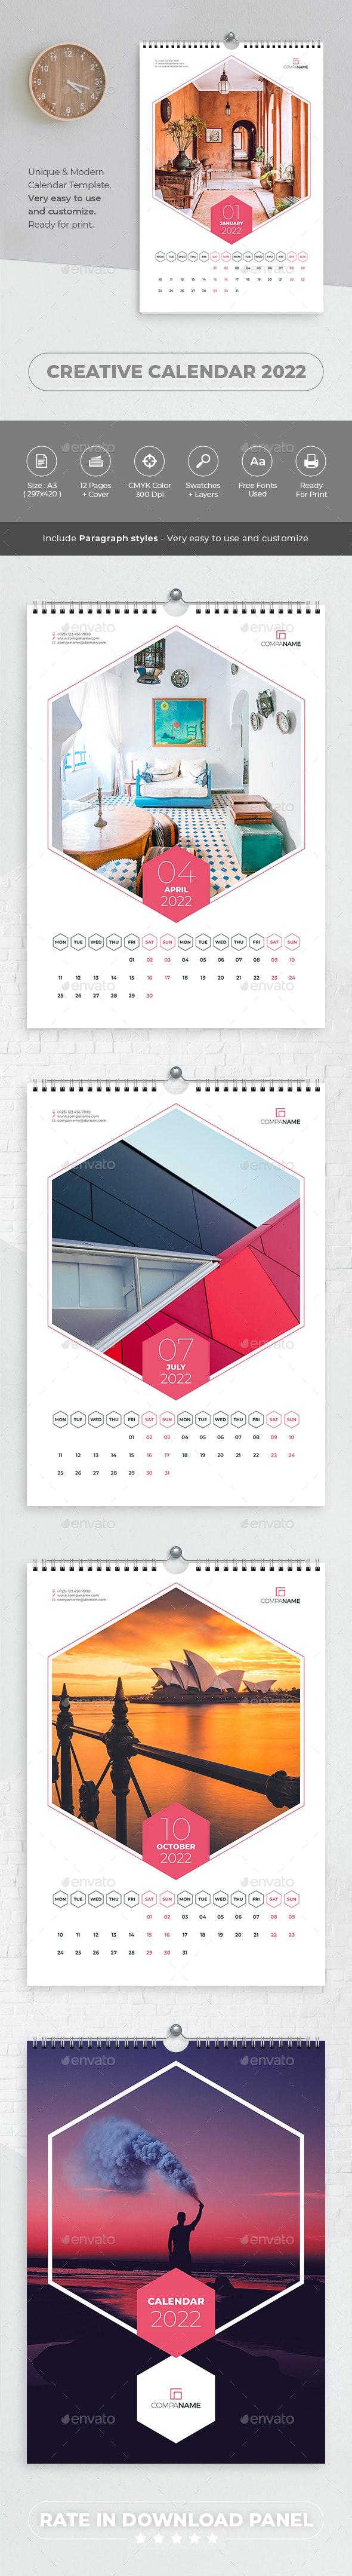 Creative Wall Calendar 2022 - Calendars Stationery